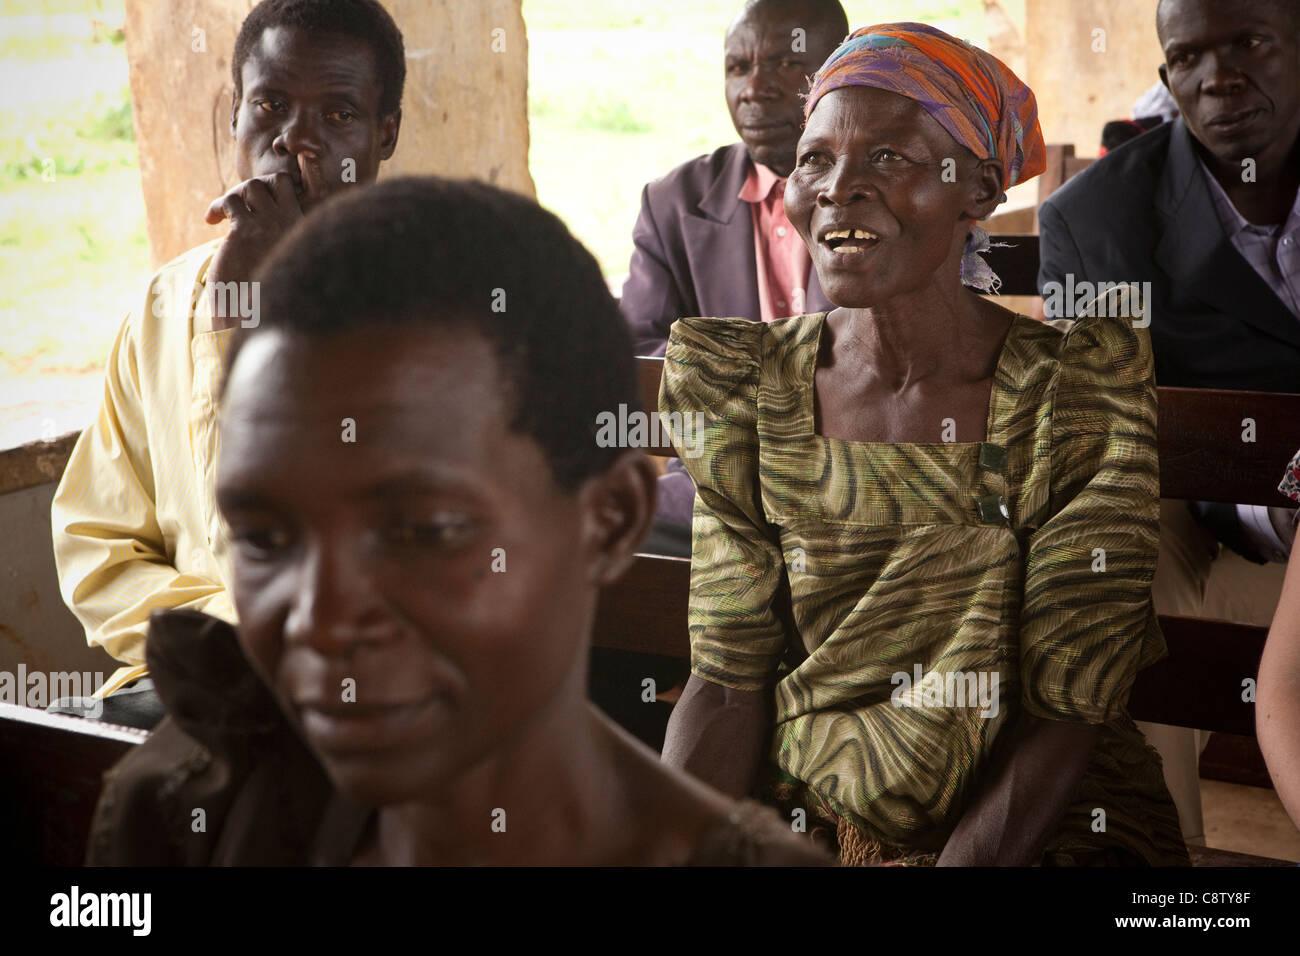 A woman attends a community meeting in Kituti village, Kibuku District, Uganda. - Stock Image